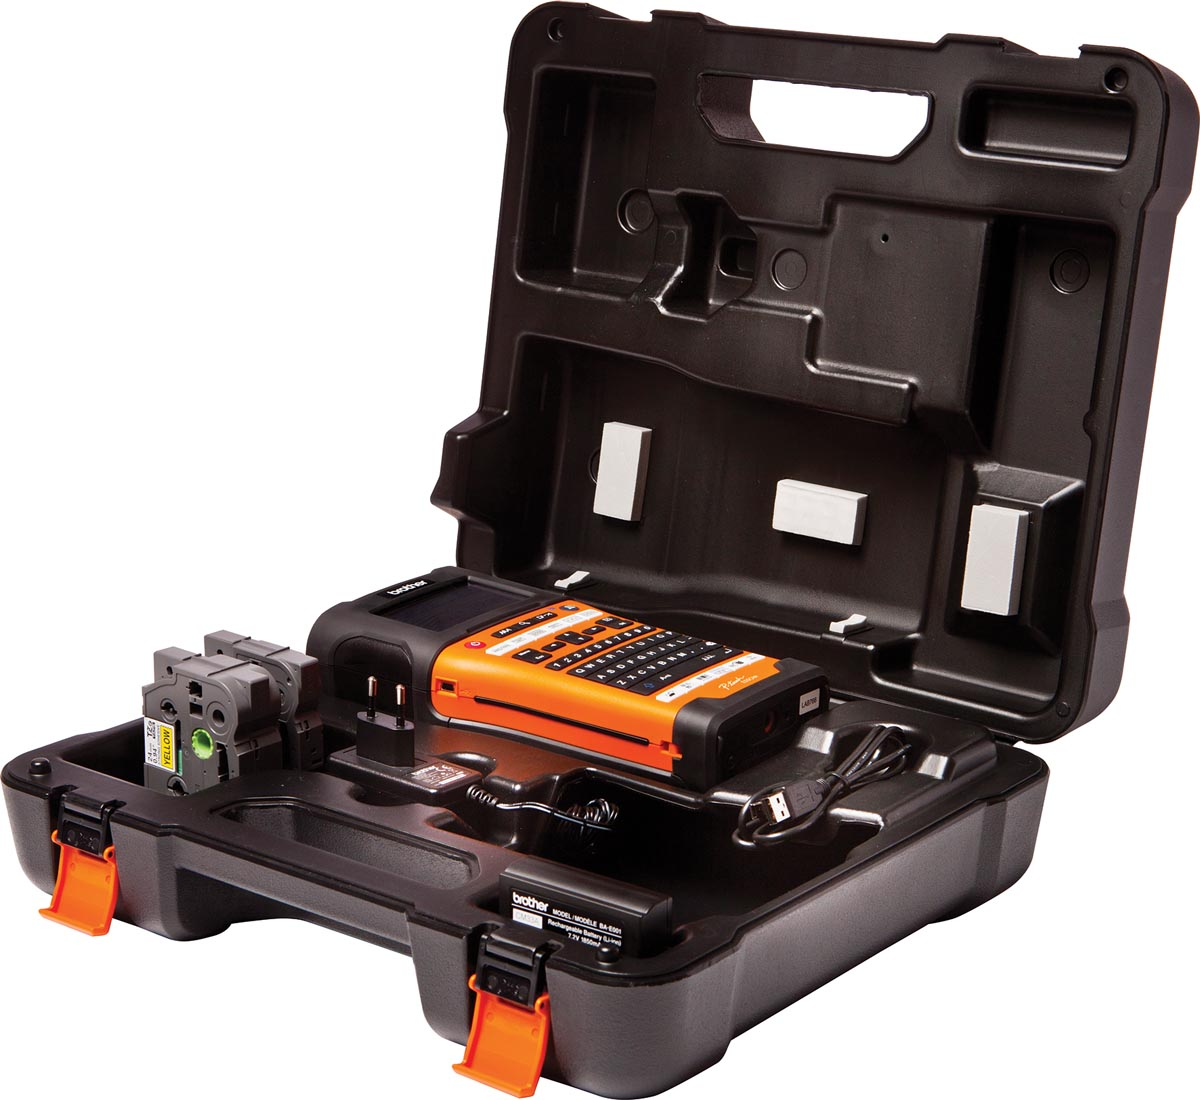 Brother beletteringssysteem PT-E550 met draagkoffer, 2 tapes, adapter en batterij-3